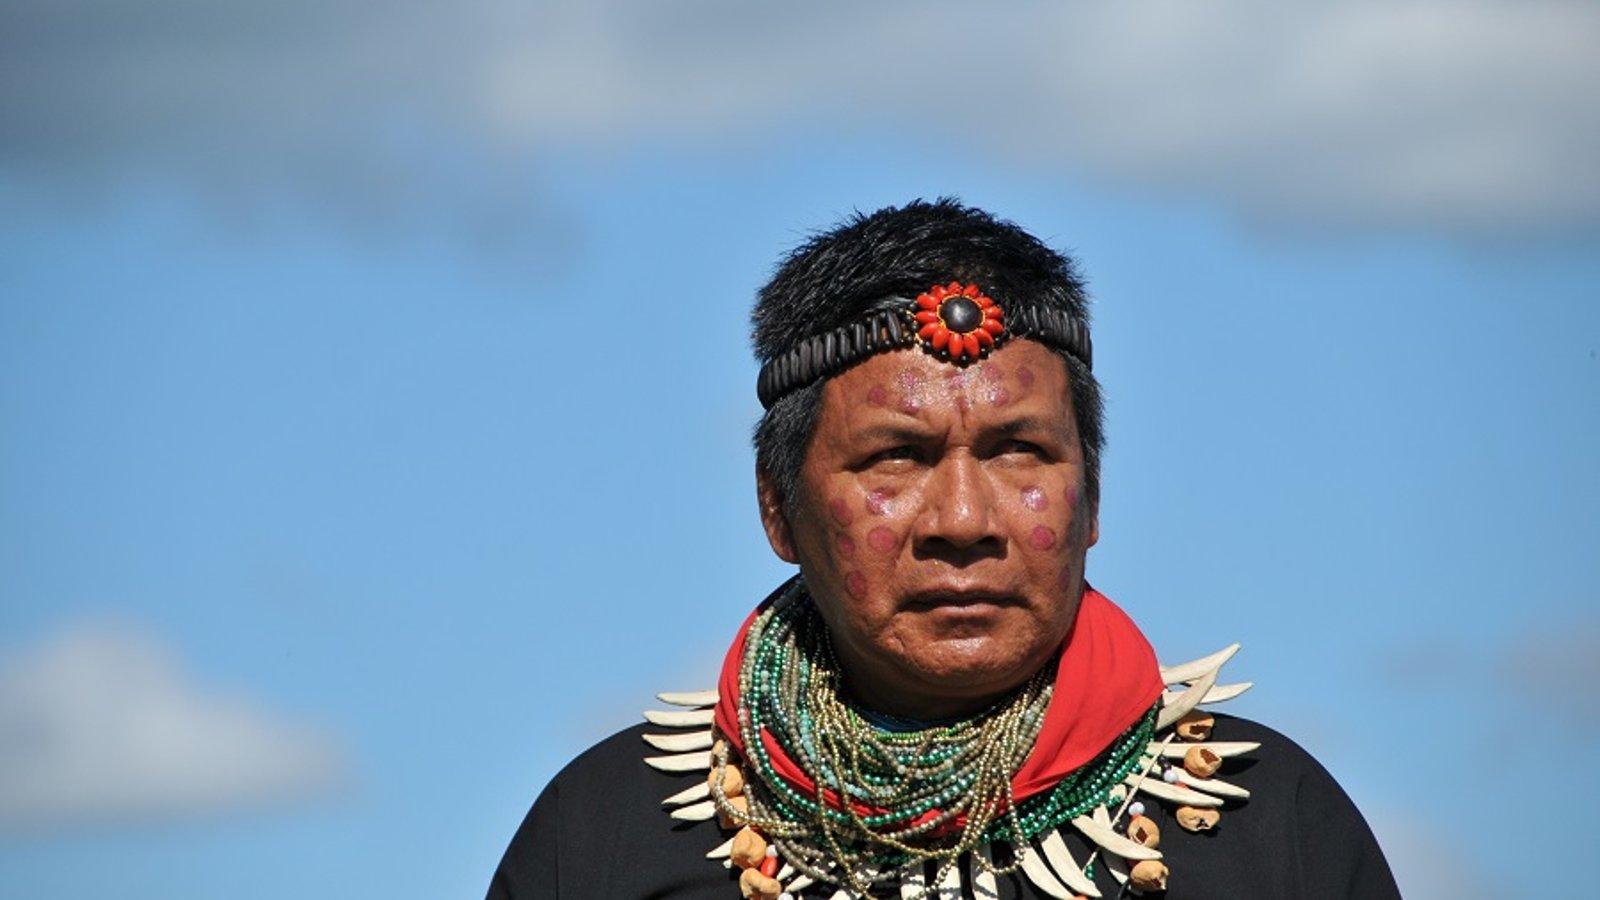 Native Planet Program 2: Ecuador - Saving Pachamama (Mother Earth)